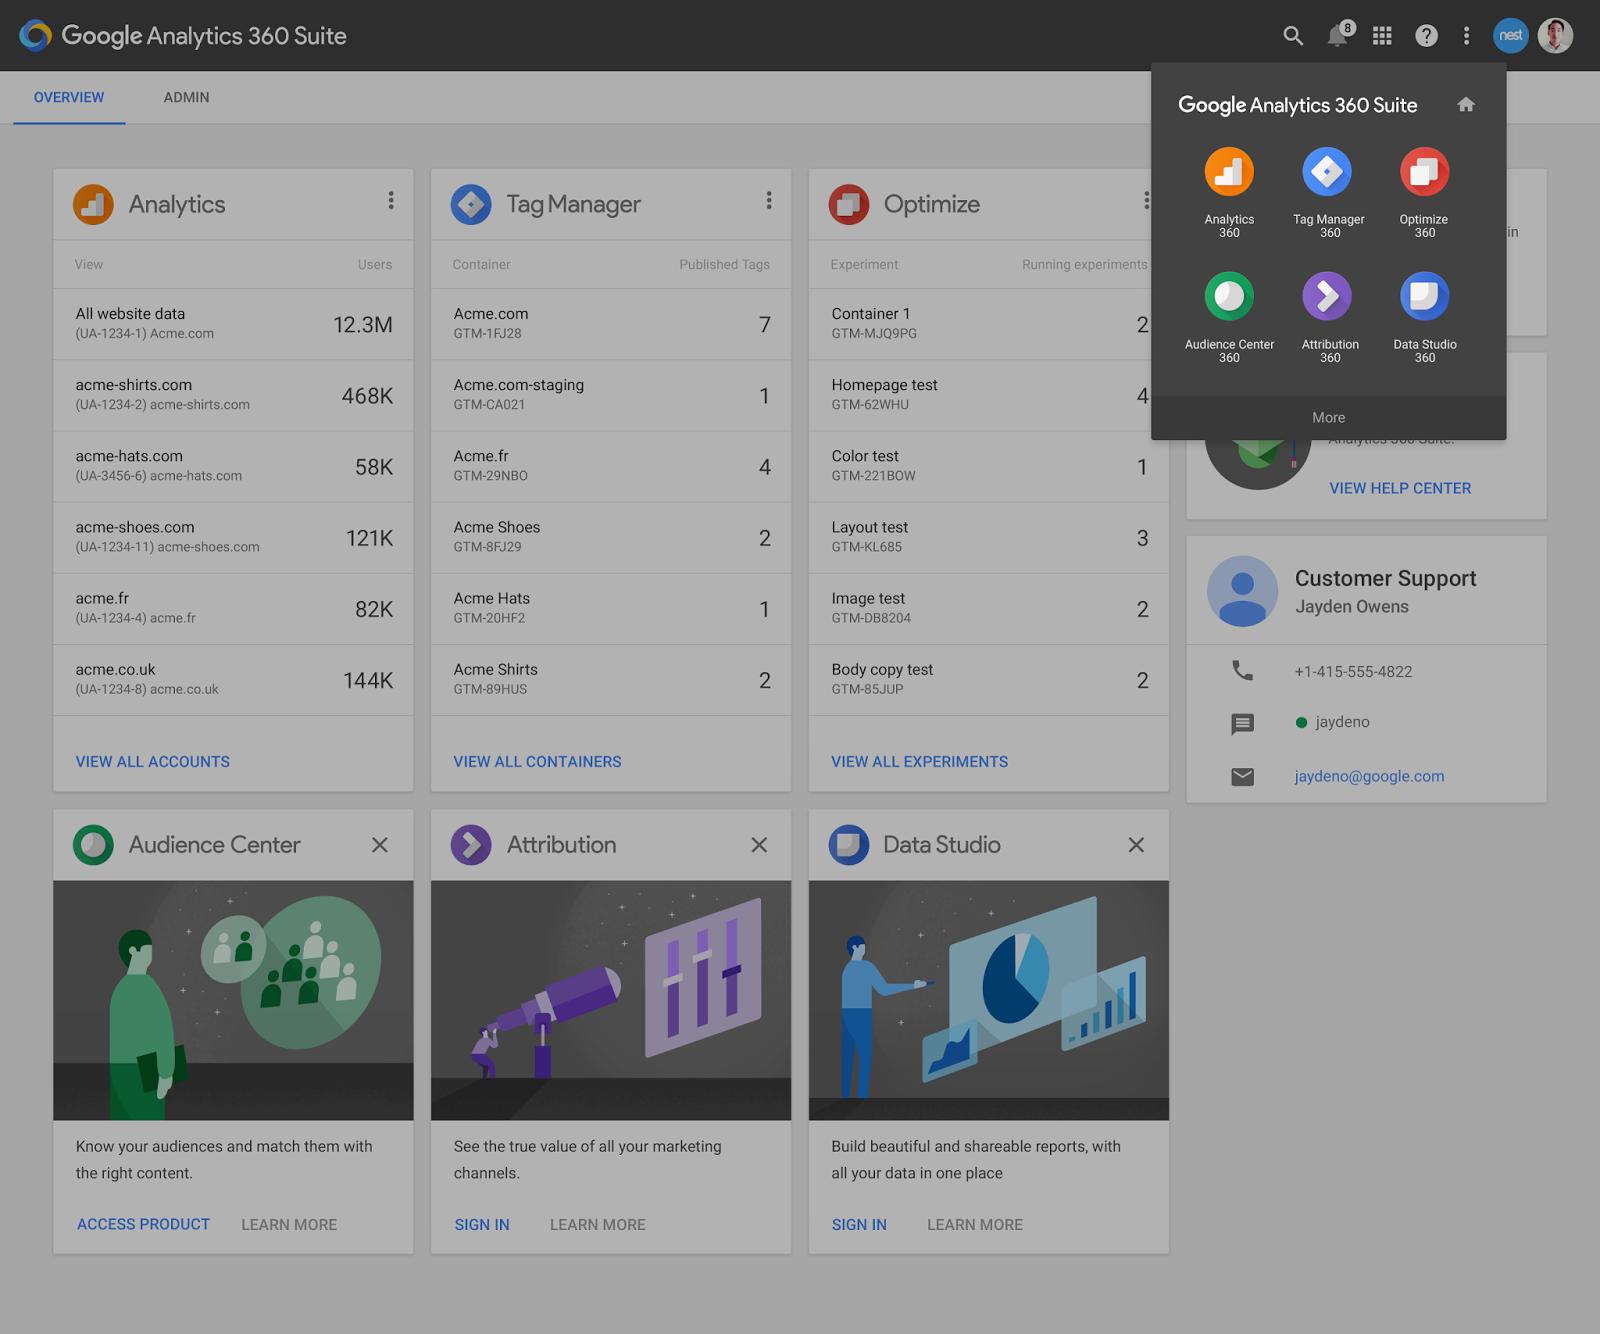 Google, Analytics 360 Suite